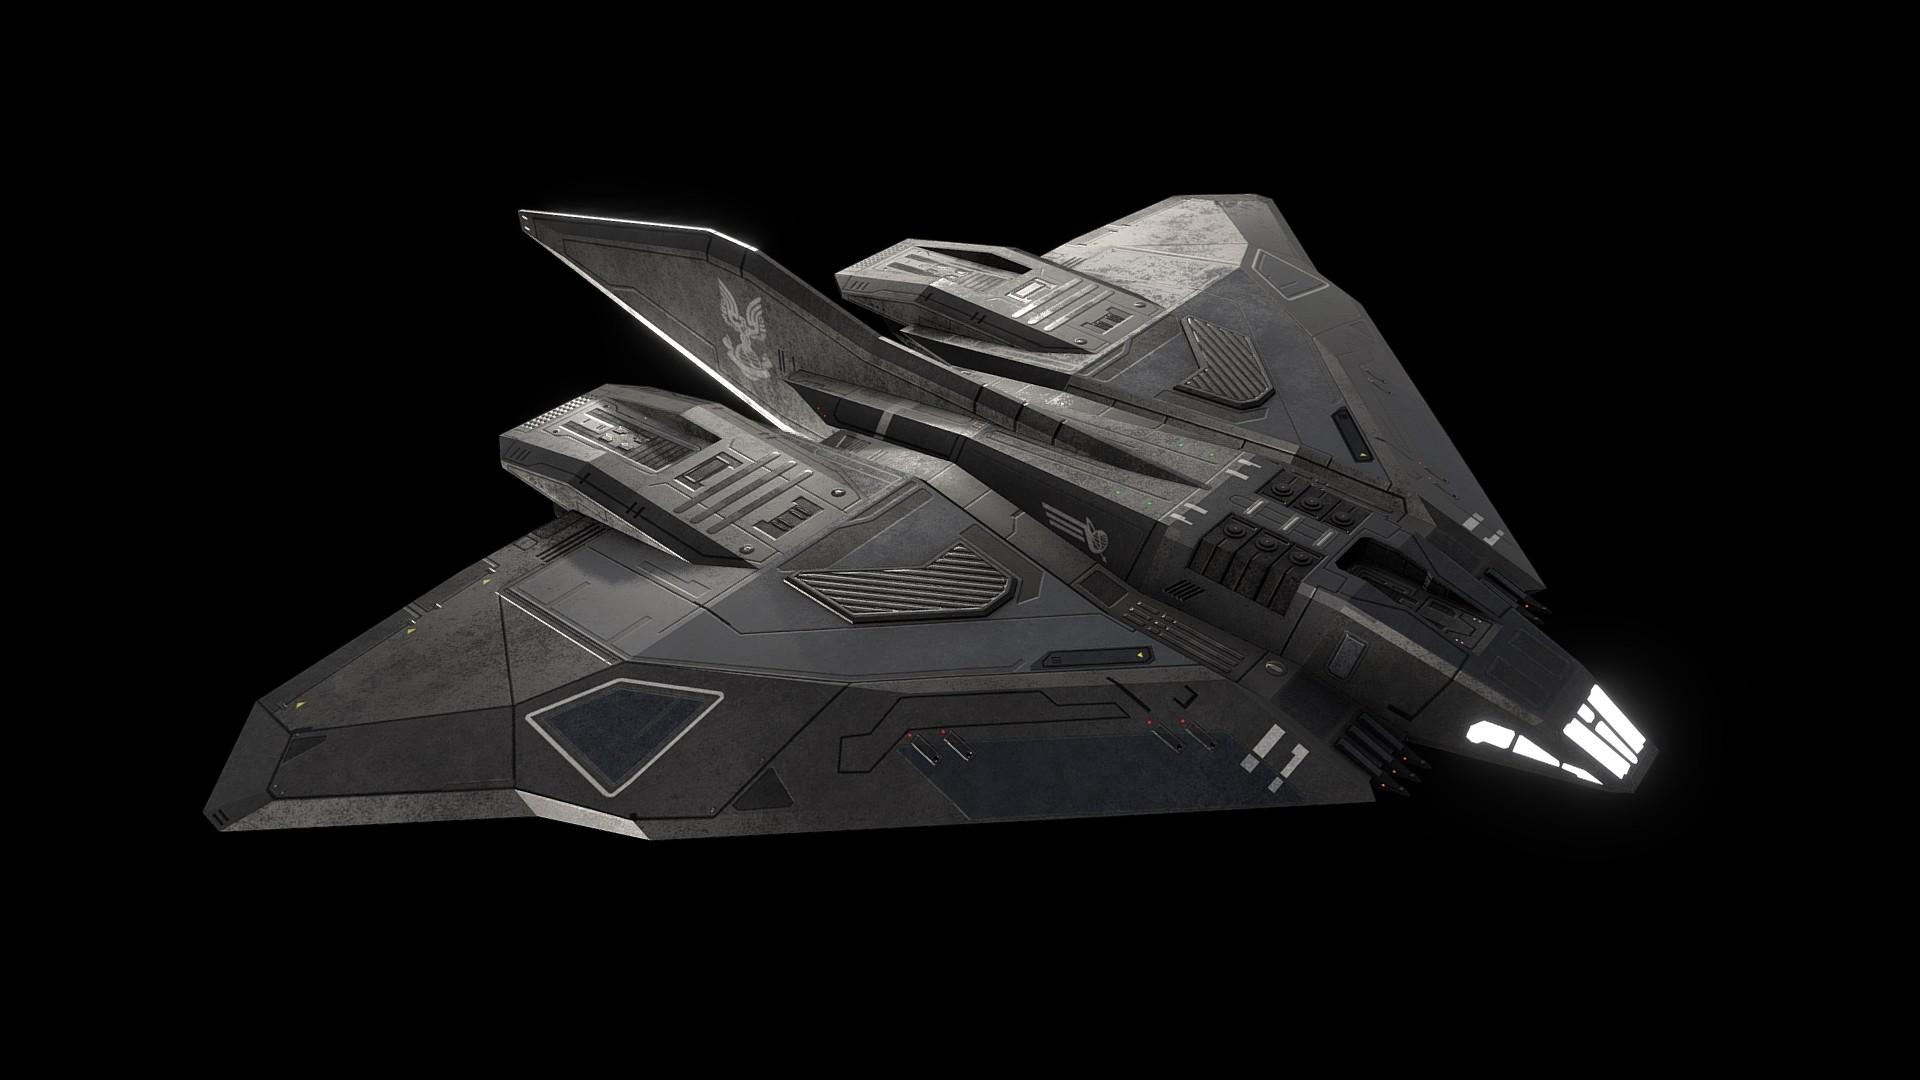 ArtStation - Sins of the Prophets: C-712 Longsword fighter